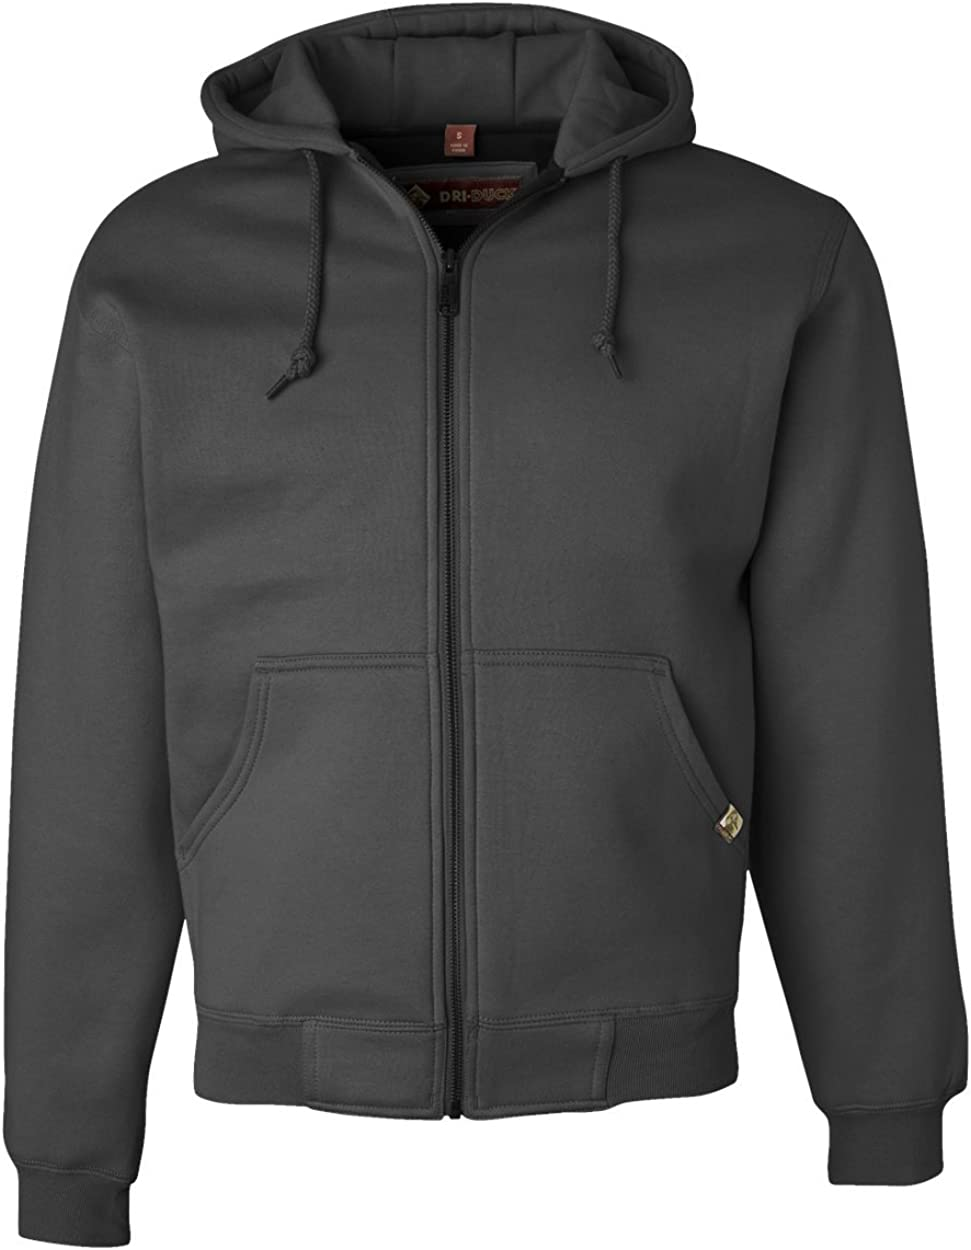 Dri-Duck Adult Crossfire Thermal-Lined Fleece Jacket. 7033 - XXX-Large - Dark Oxford